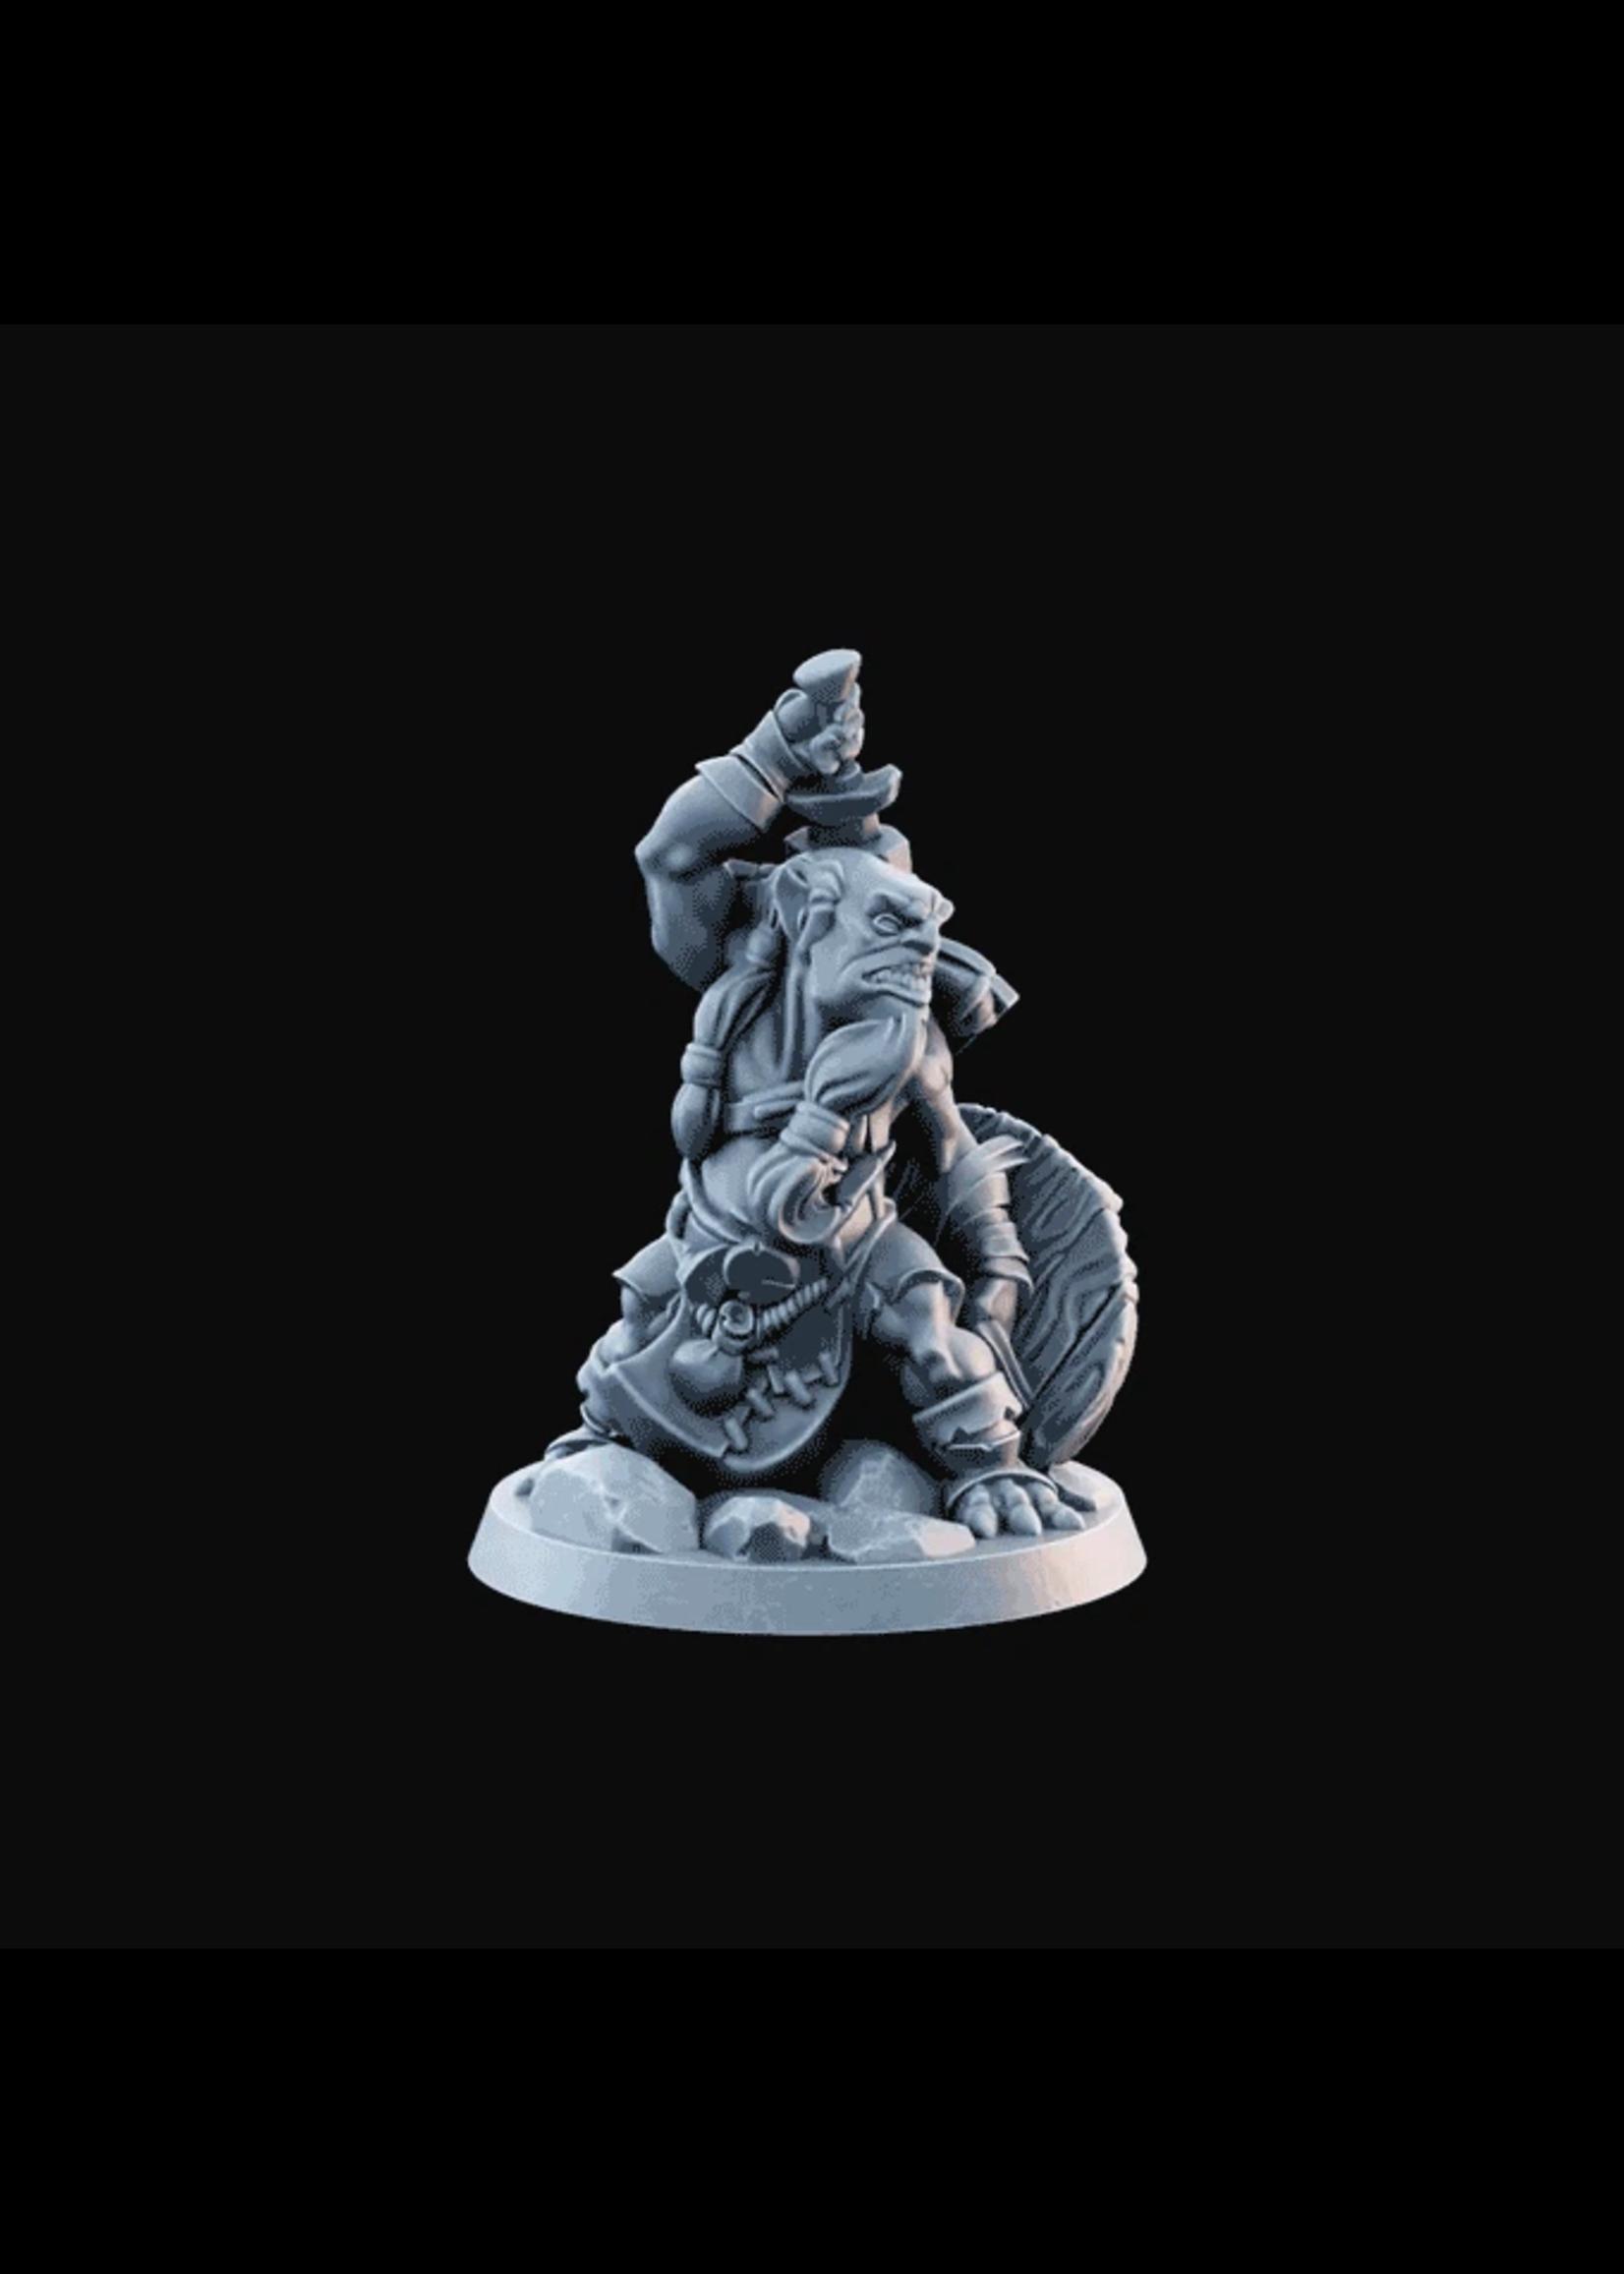 3D Printed Miniature - Goblin02  - Dungeons & Dragons - Desolate Plains KS